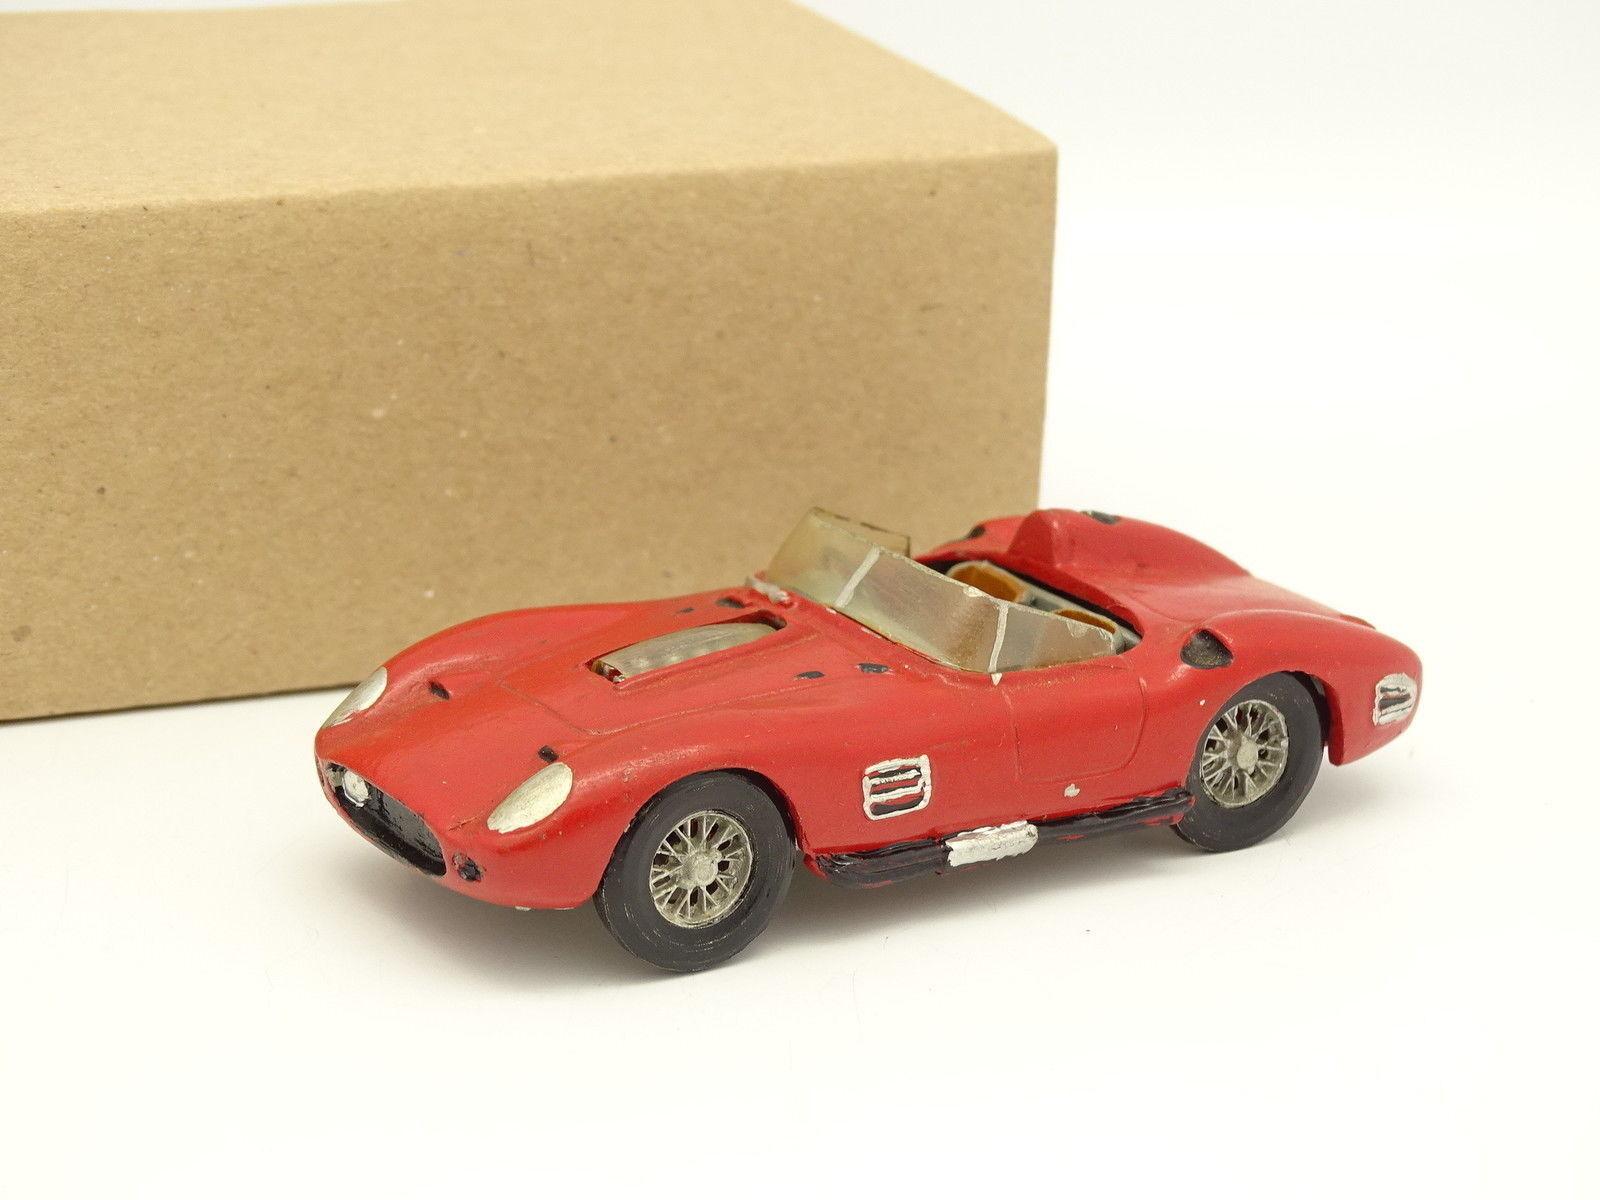 John Day Set Metal Built 1 43 - Ferrari 250 TRS 1960